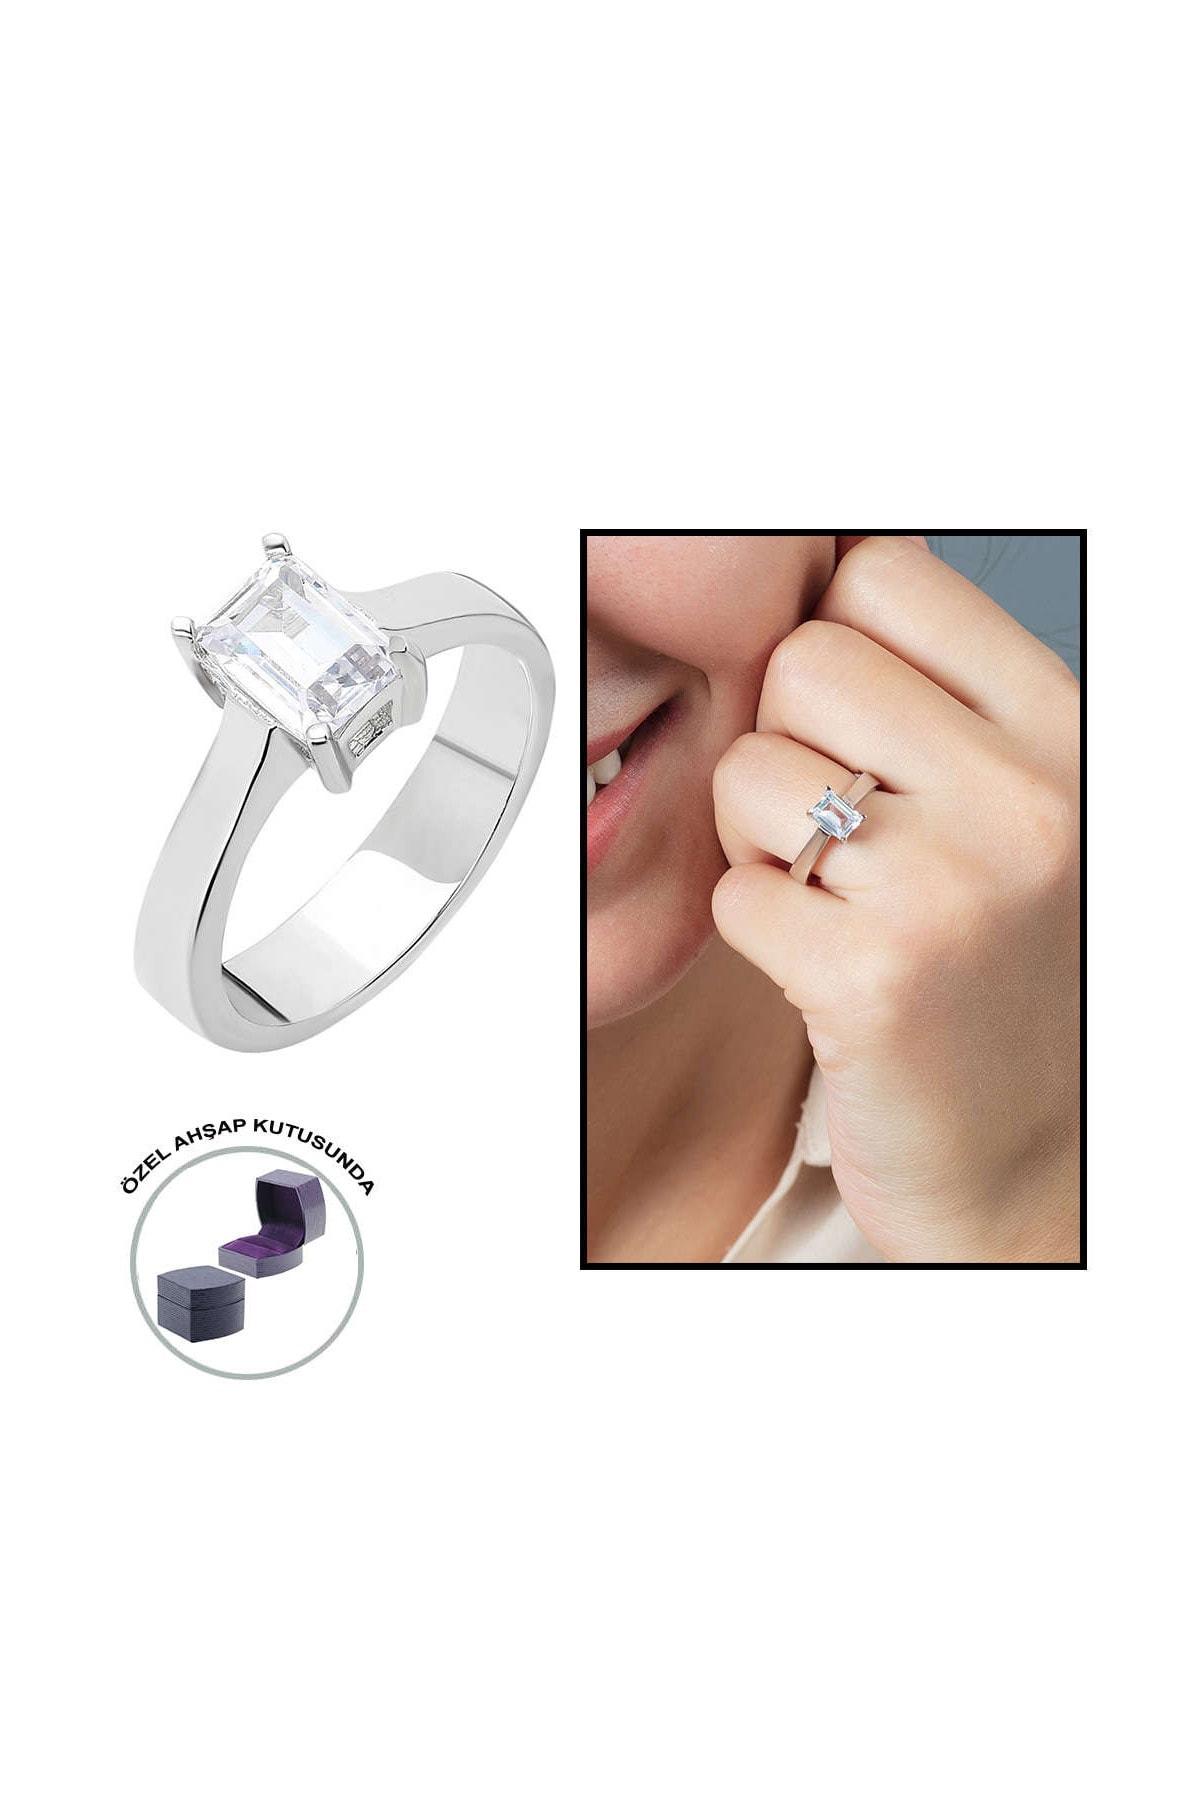 Tesbihane Starlight Diamond Pırlanta Montür Minimal Tasarım 925 Ayar Gümüş Bayan Baget Yüzük 102001792 0